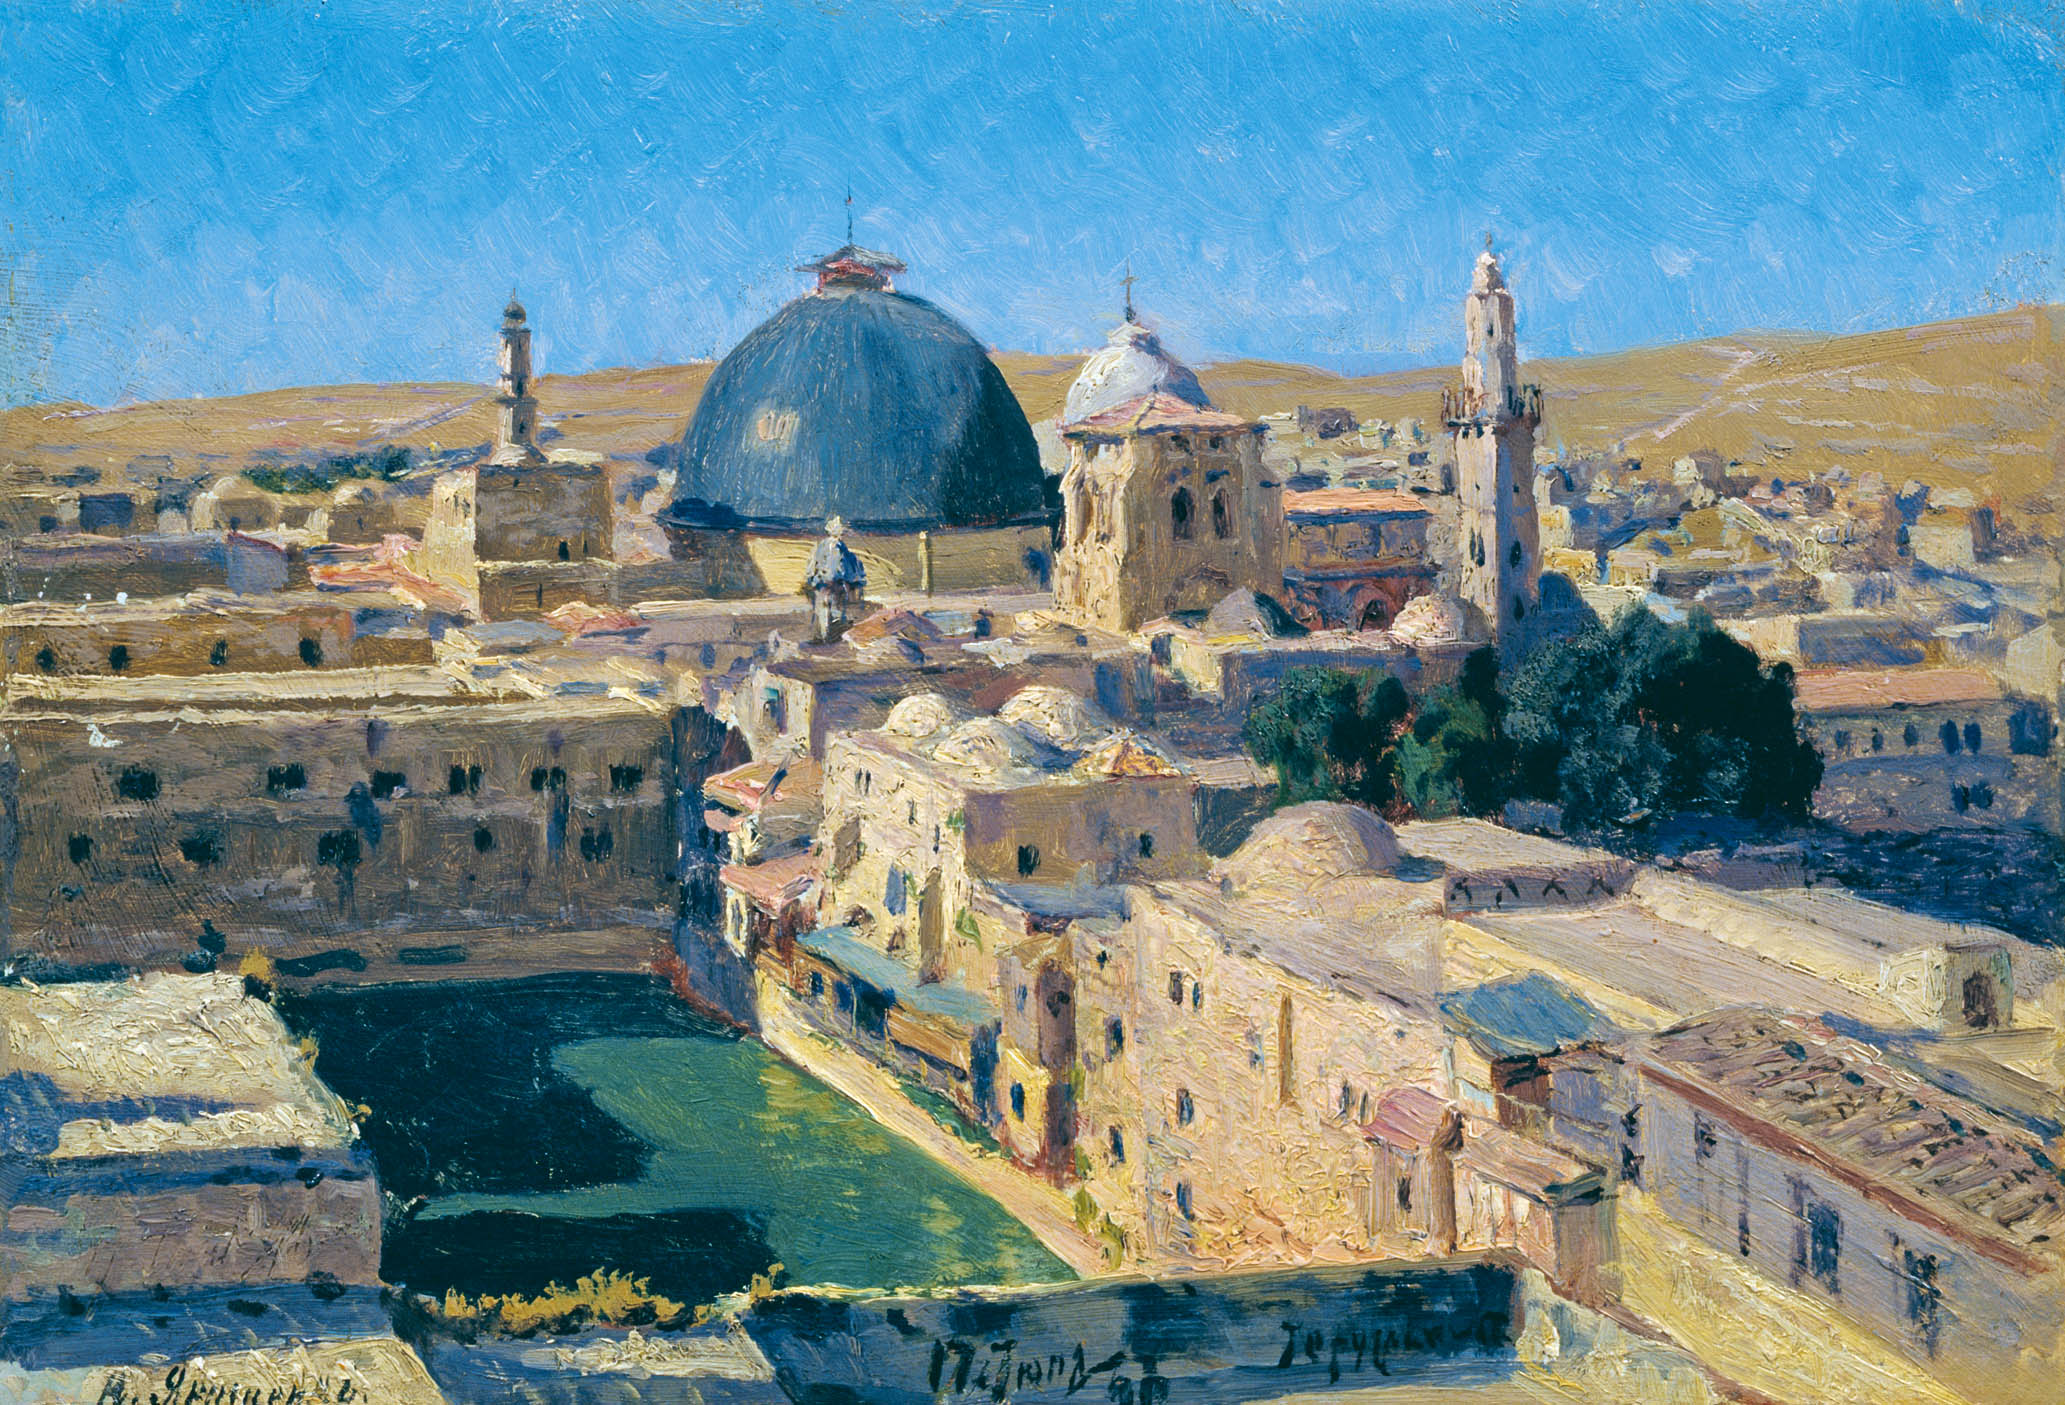 Иерусалим. 1896. Этюд. Фанера, масло. 24,2х36,5